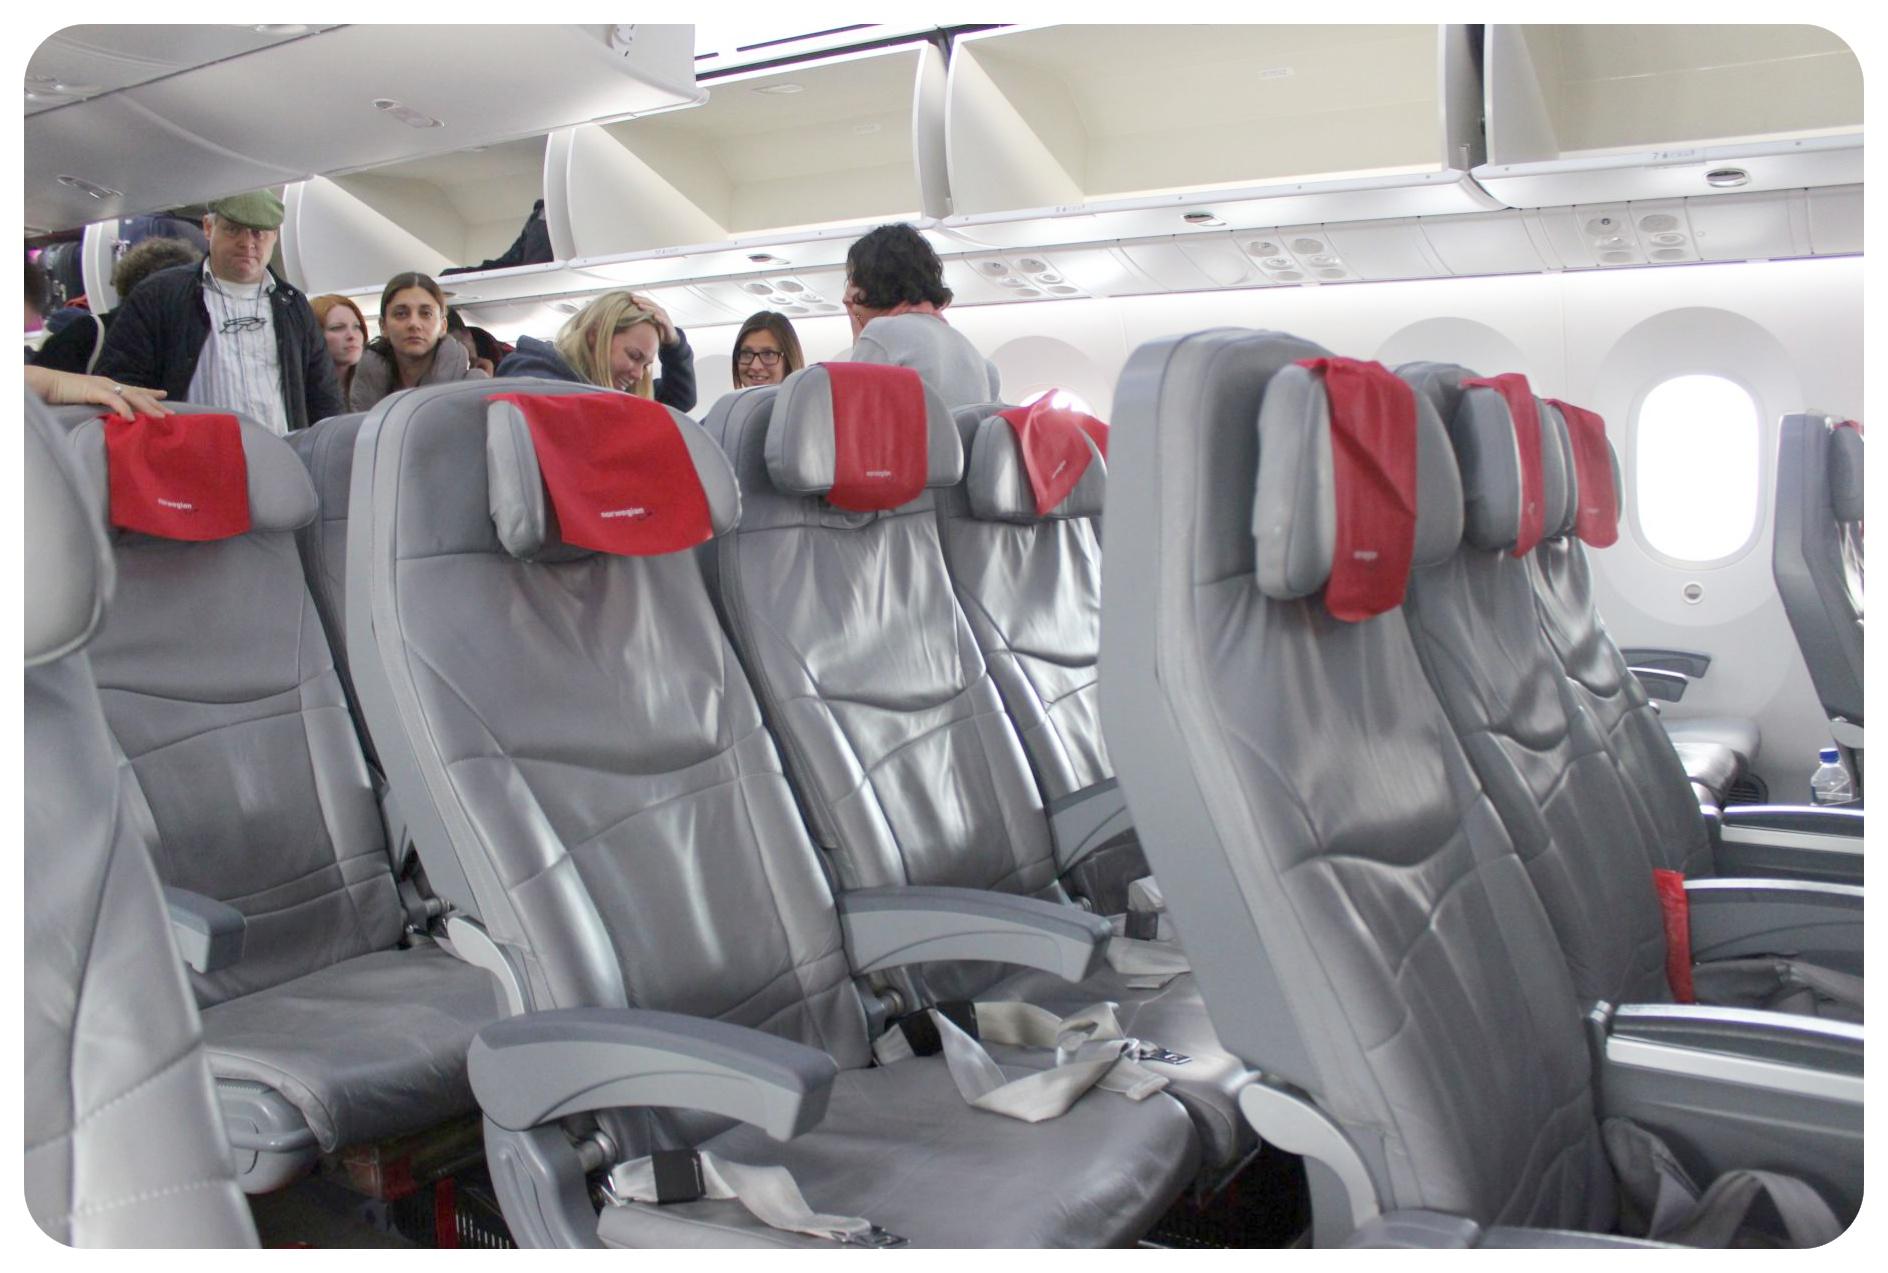 fly Norwegian Air